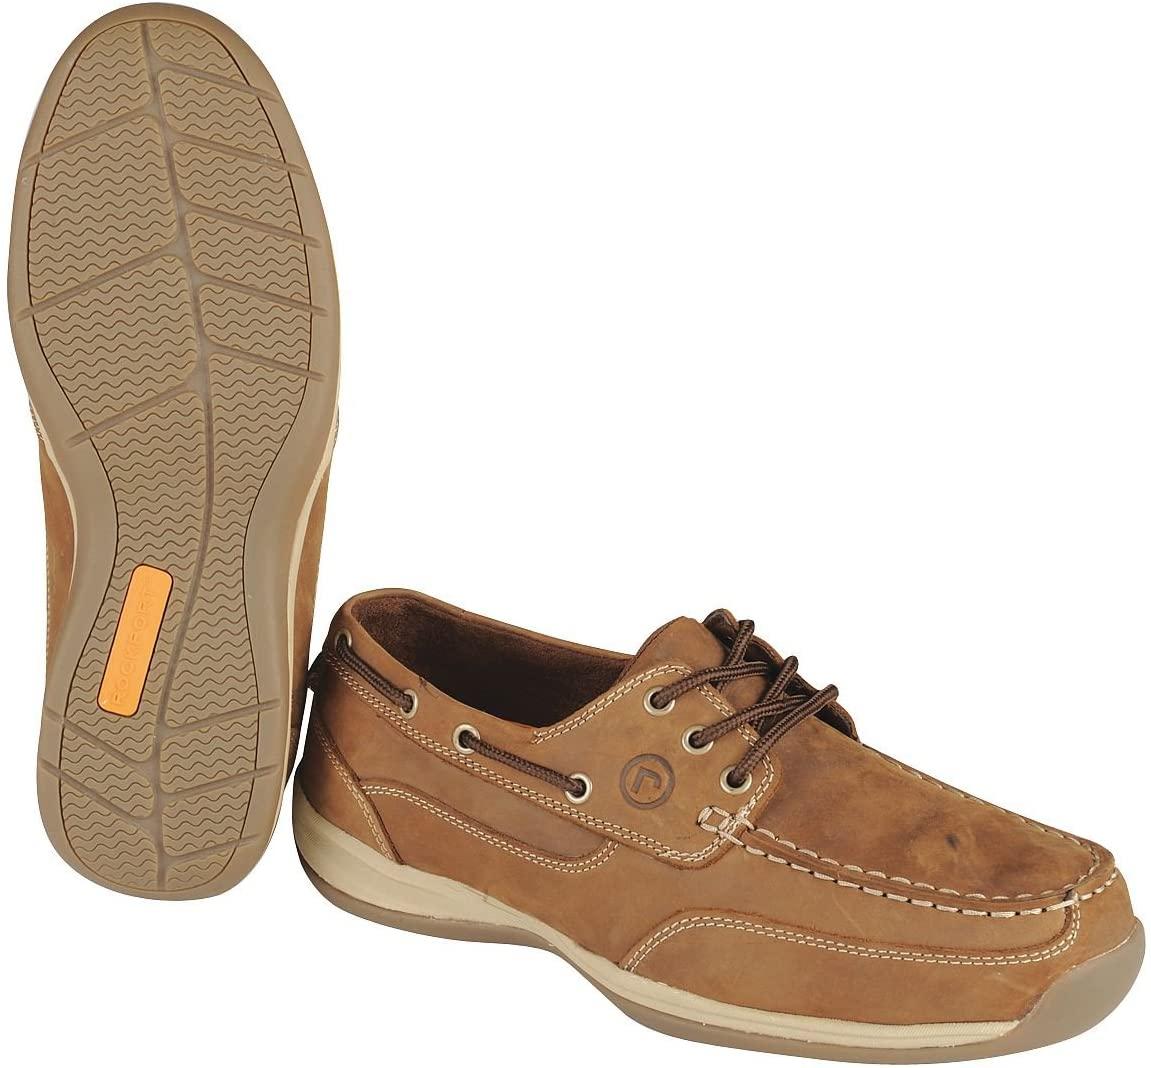 Boat Shoes, STL, Mn, 13W, BRN, PR